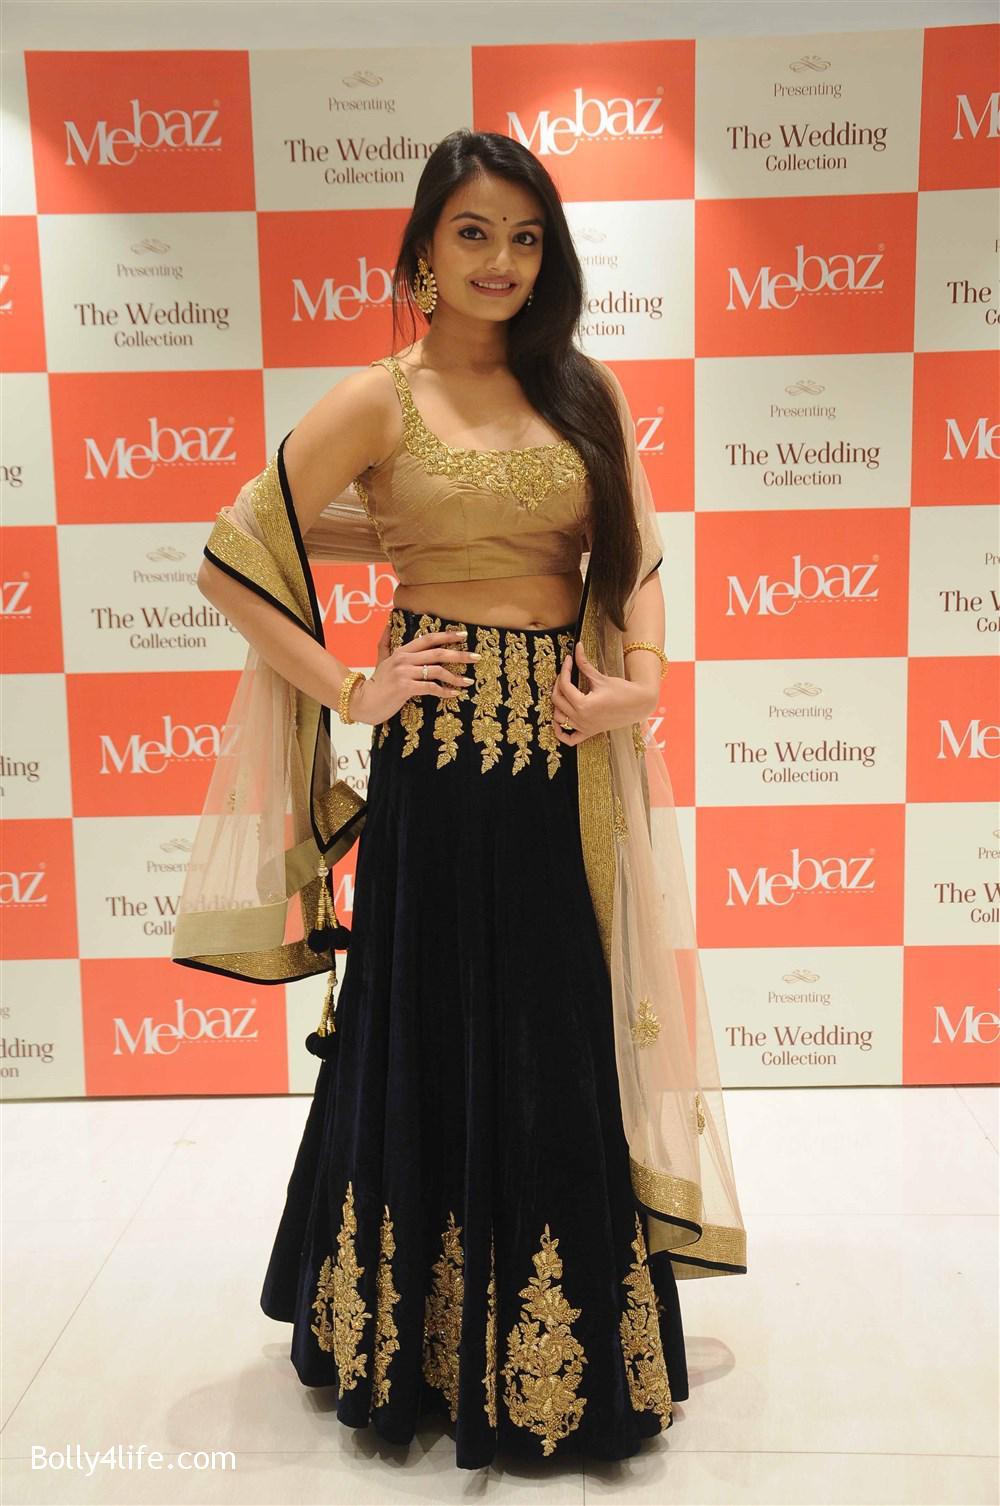 mebaz_felicitates_mr_world_2016_rohit_khandelwal_mebaz_store_bangalore_247fba4.jpg